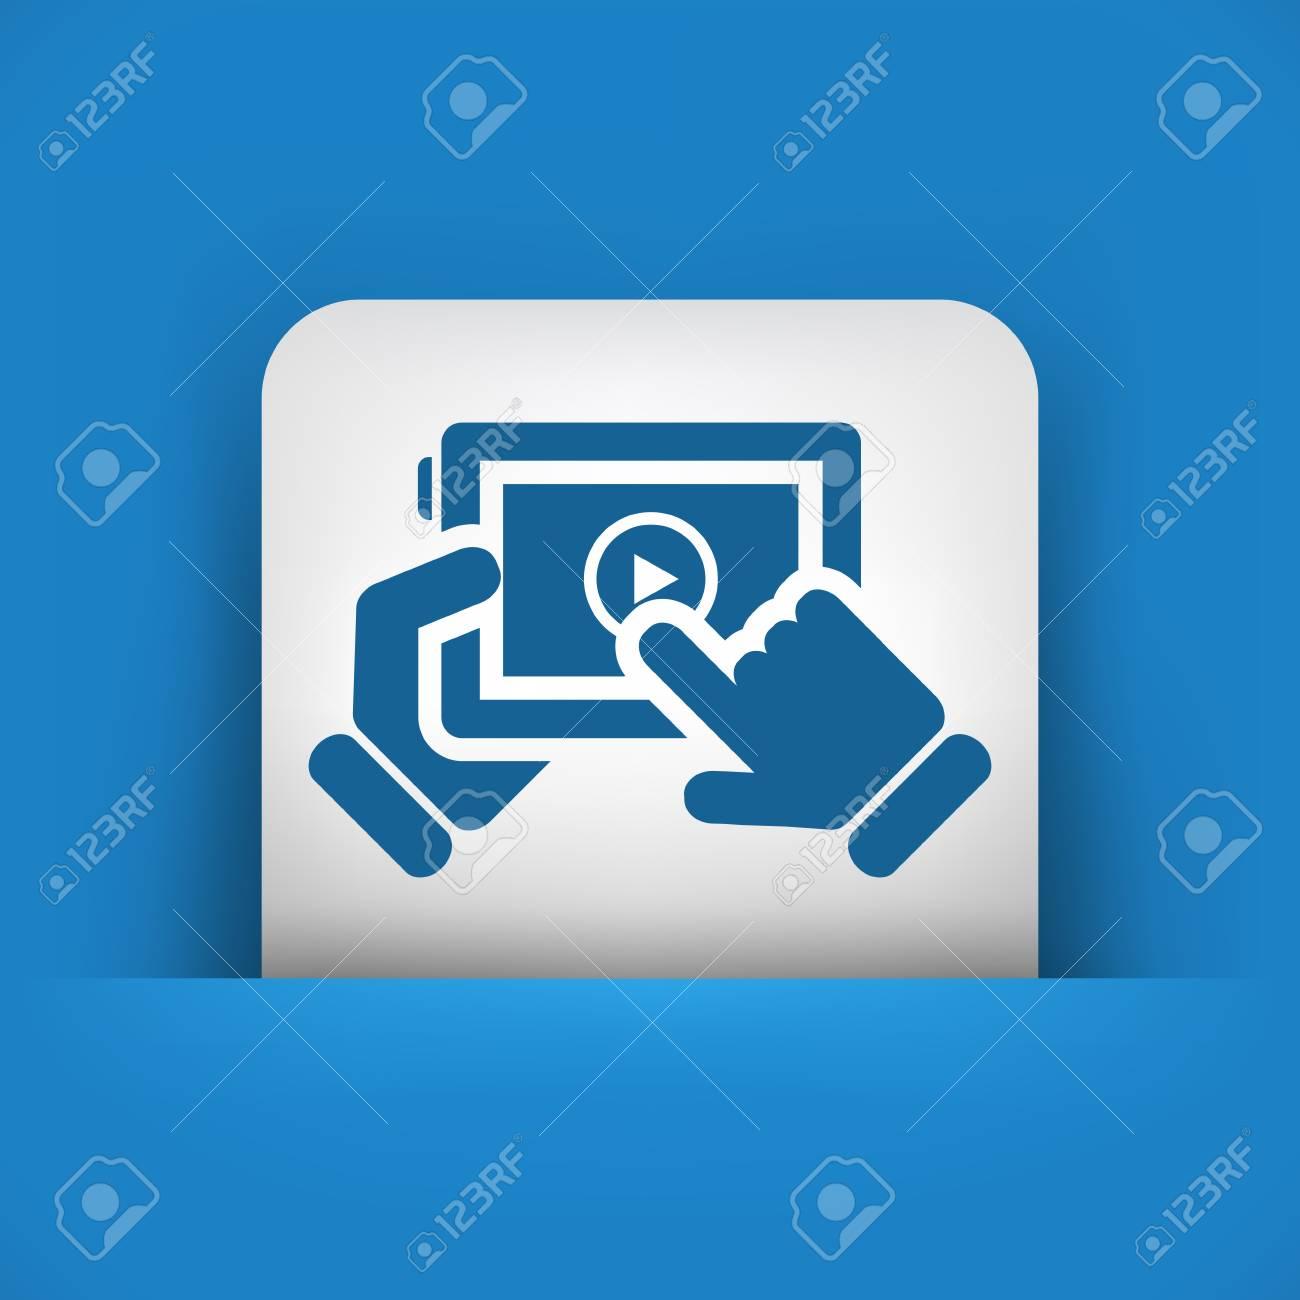 Multimedia player icon Stock Vector - 22795488